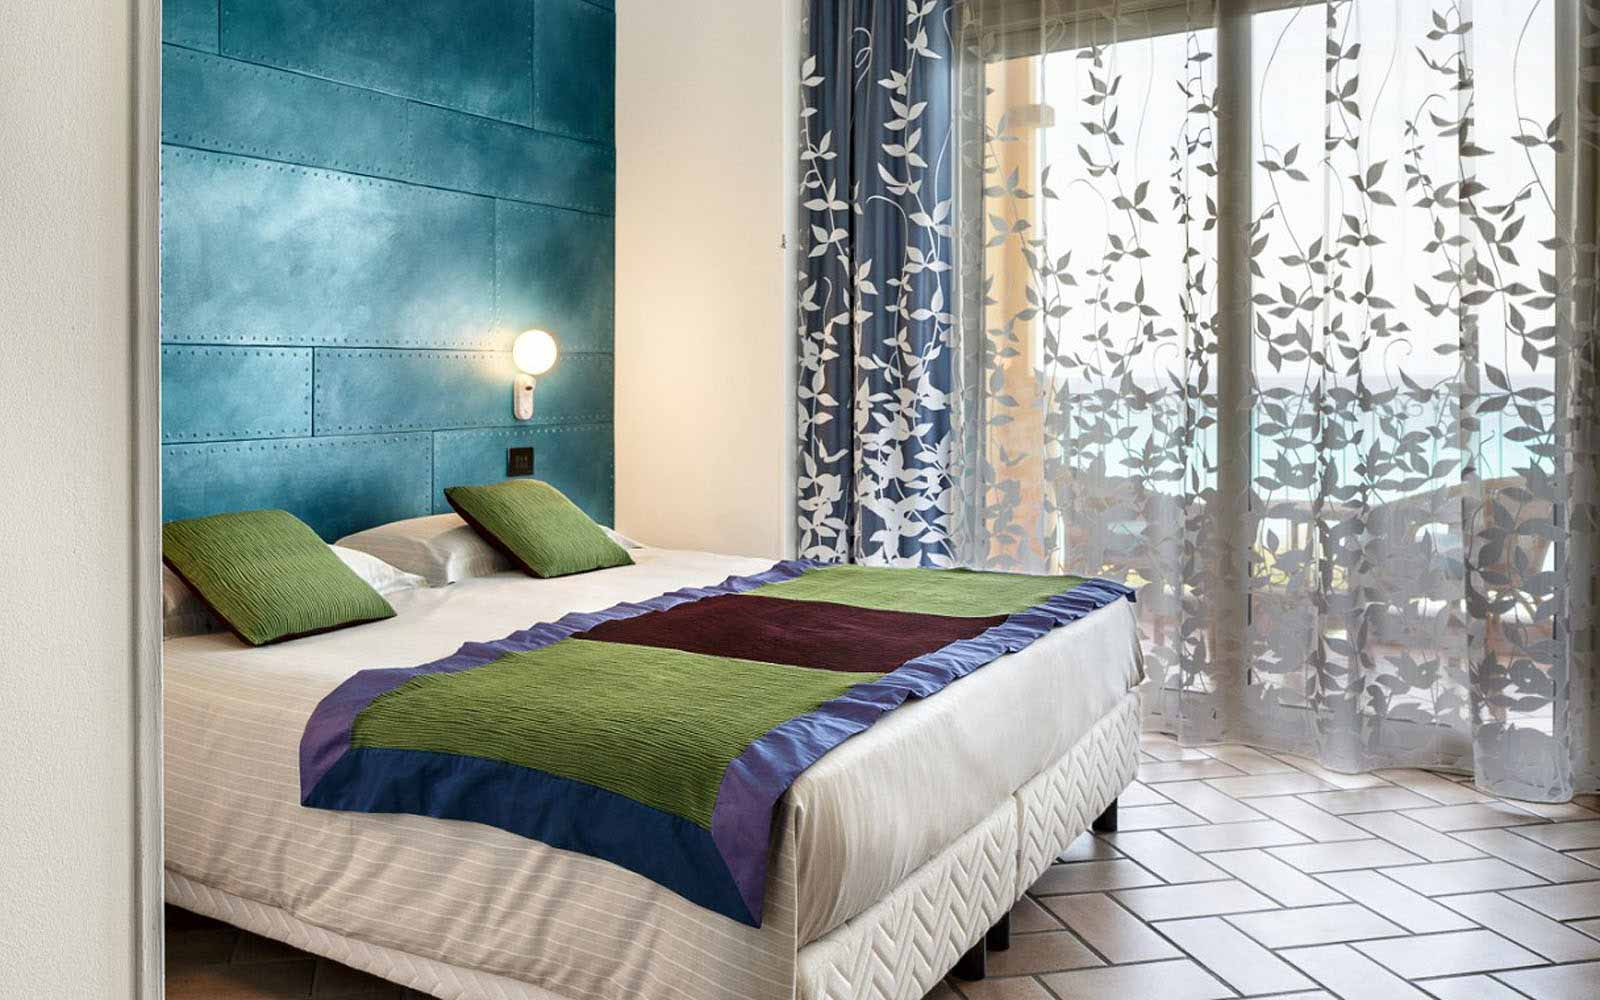 Classic Seaview Room at Hotel Stella Maris